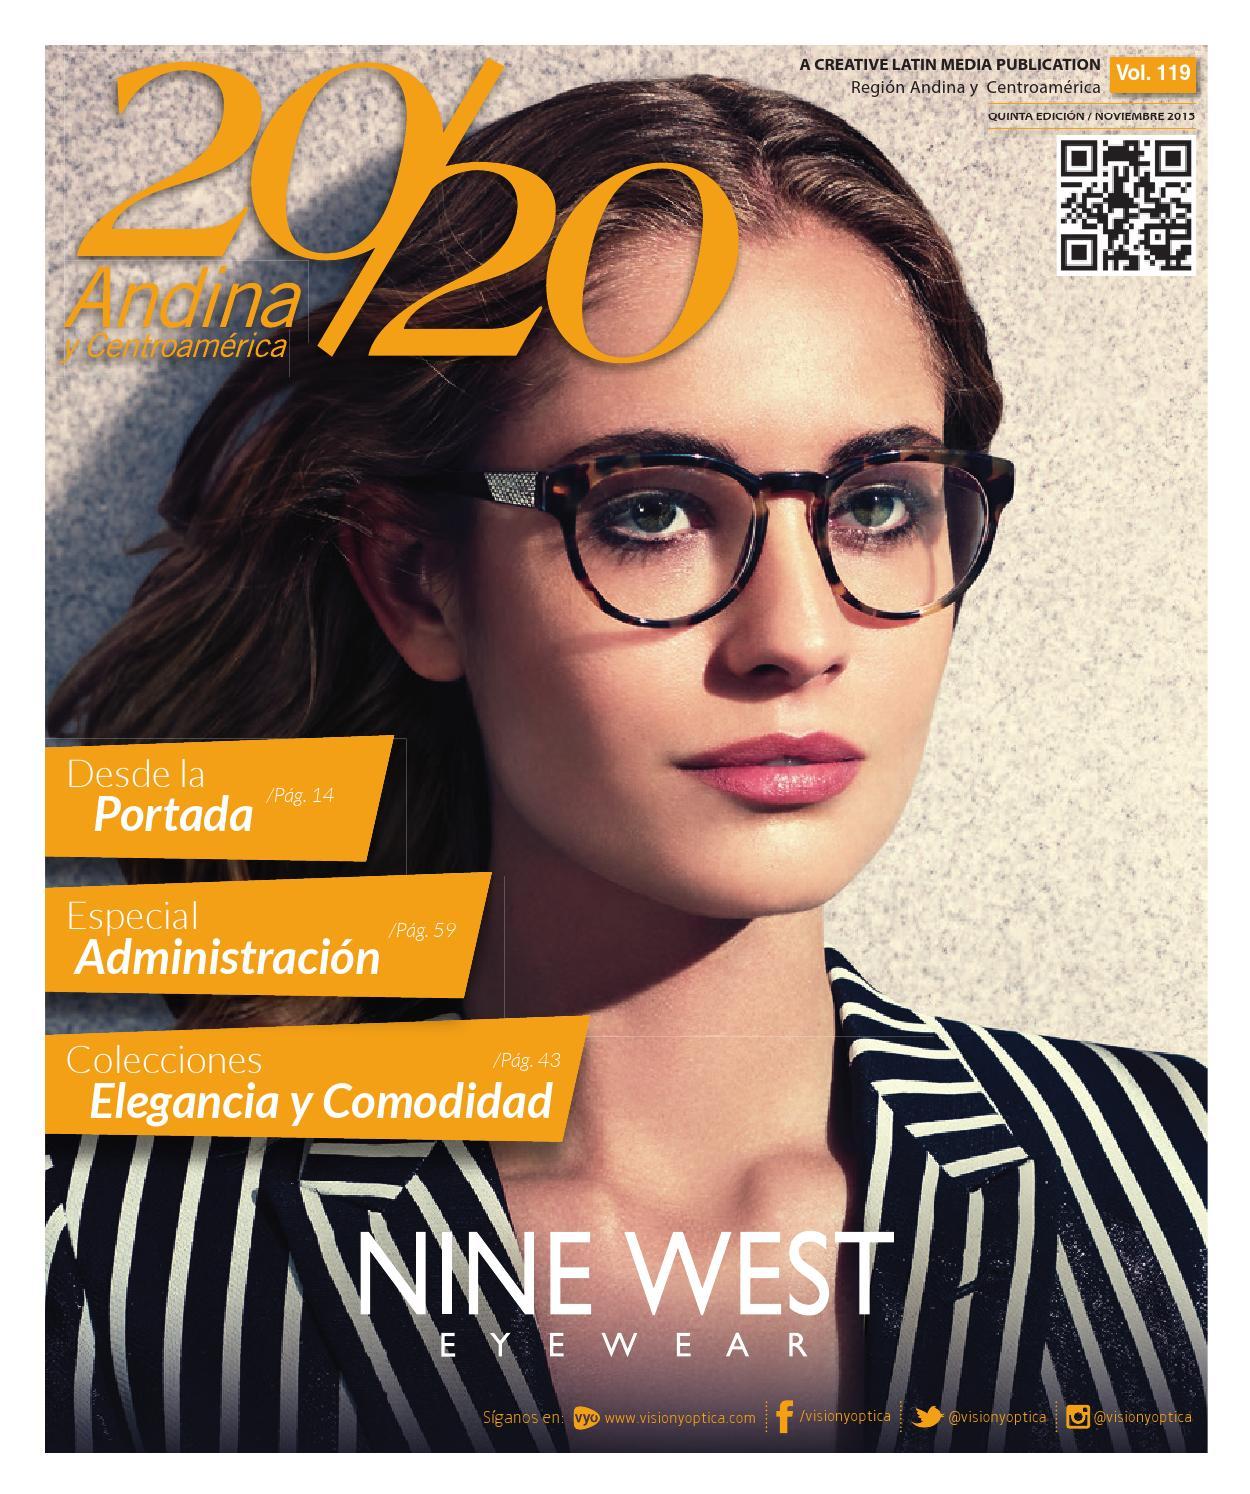 2020 5ta 2015 todo en baja by Creative Latin Media LLC - issuu